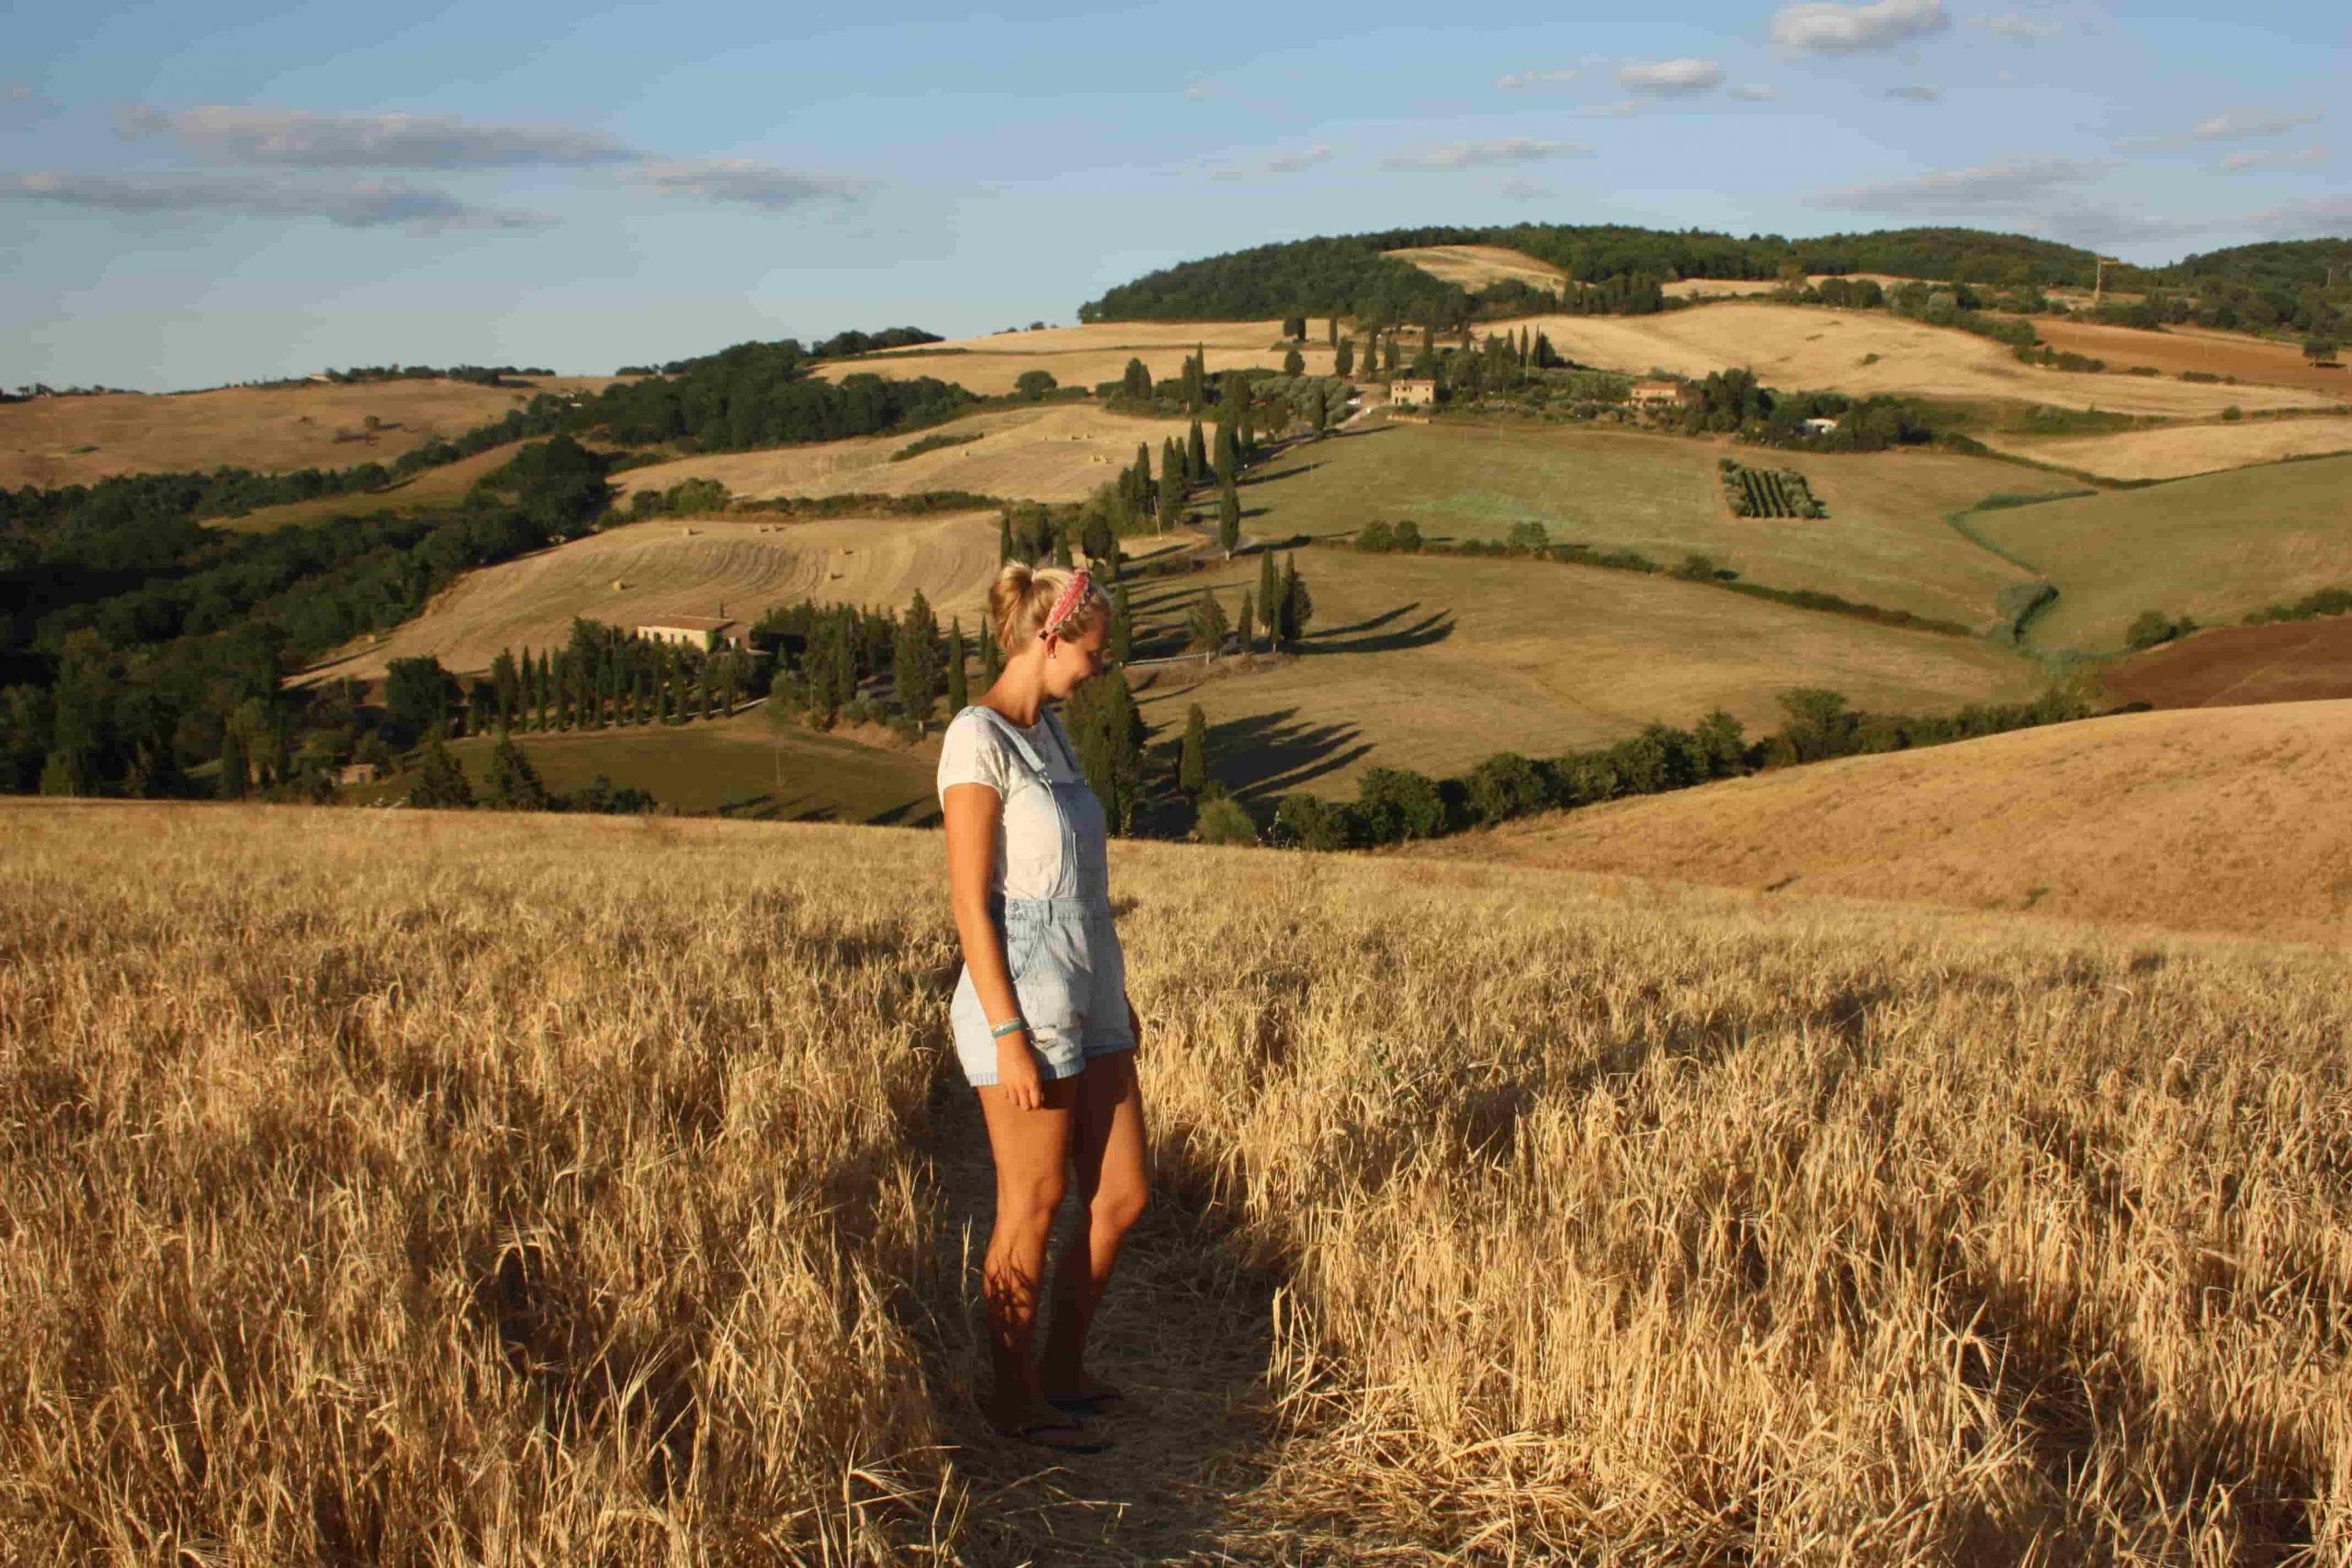 Toskana – unterwegs im Herzen von Italien